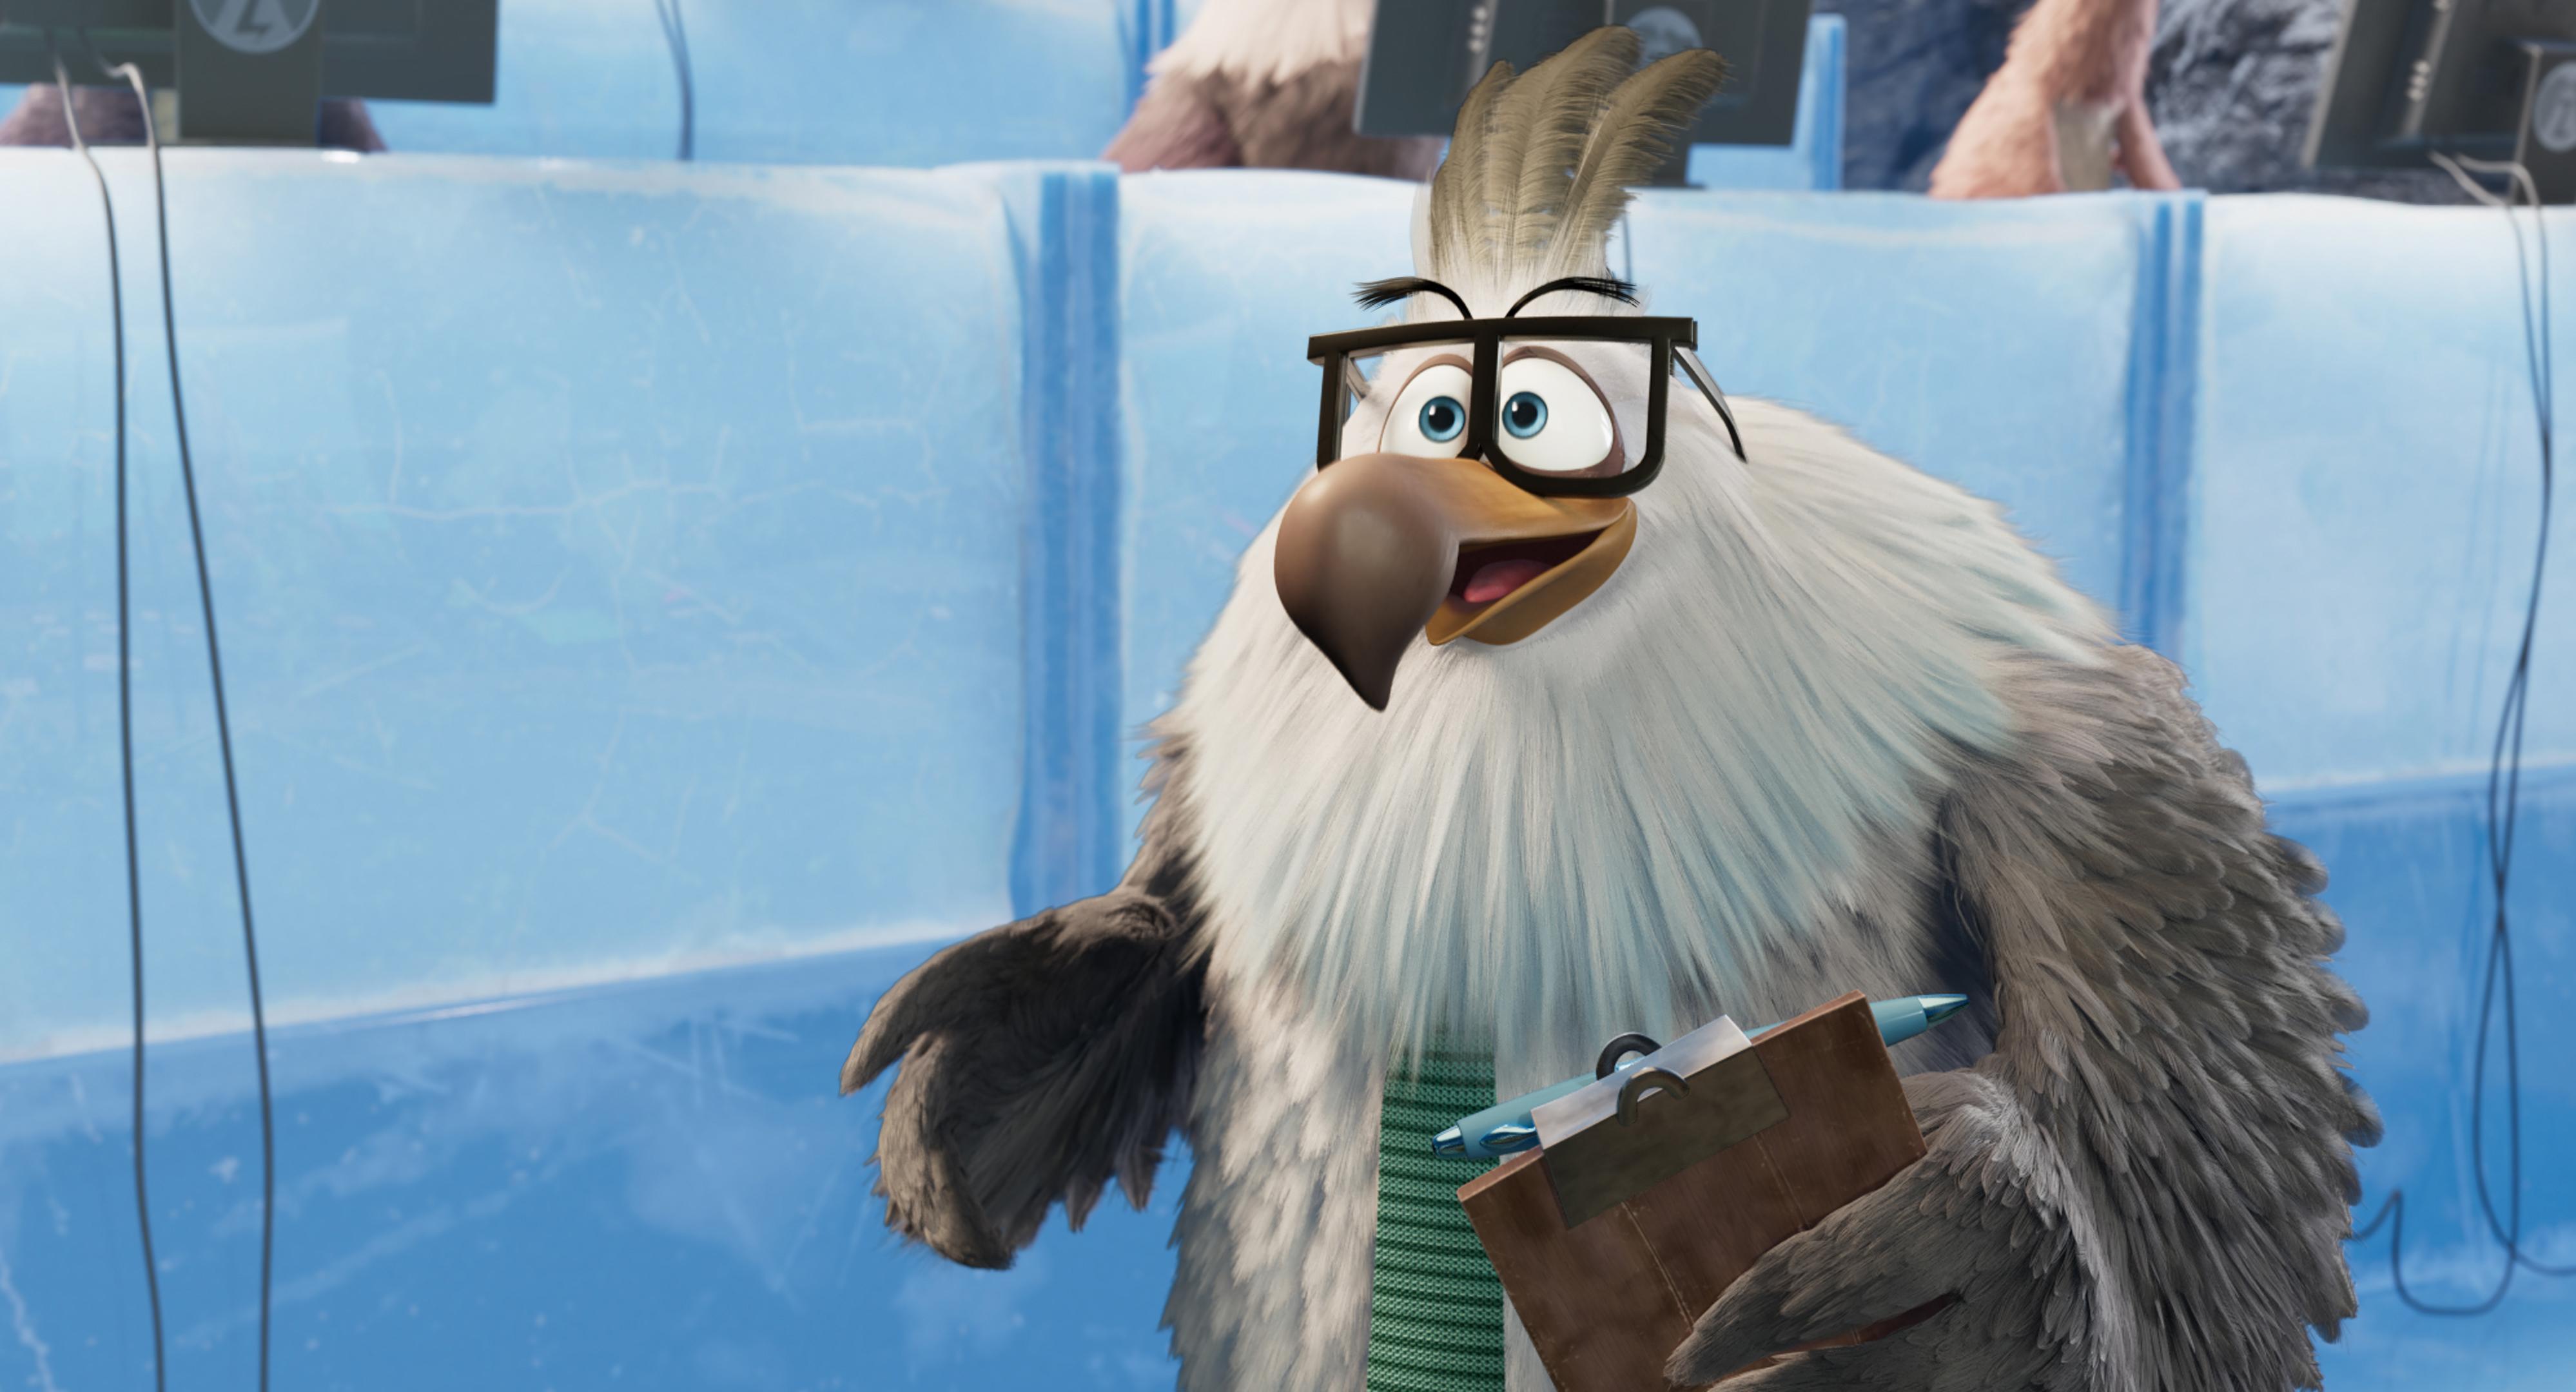 Eugenio Derbez - Angry Birds 2 - Hot List - 2 - September 2019